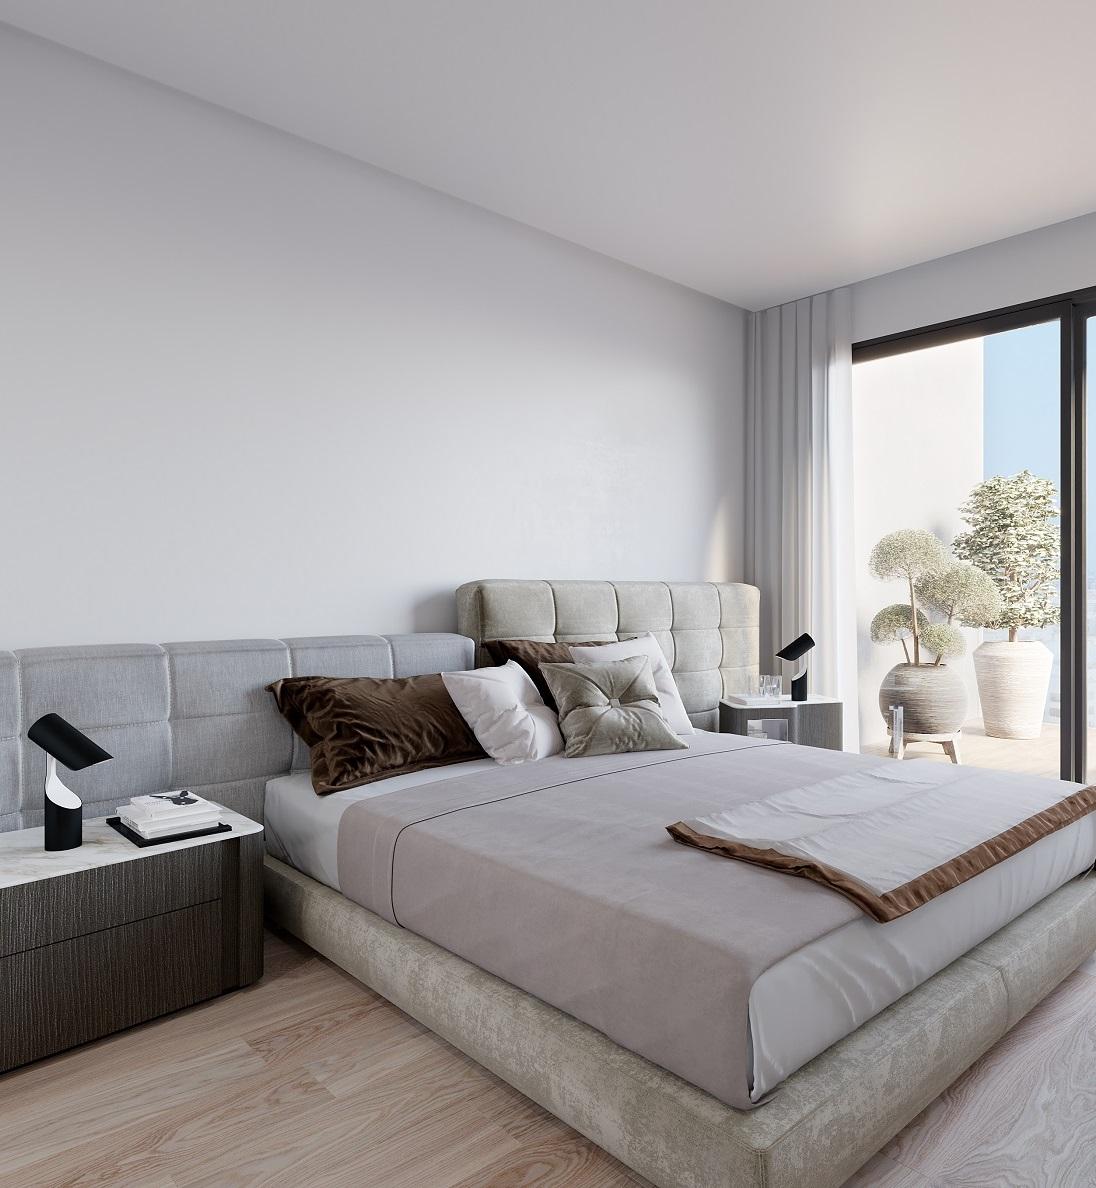 beluga_rueda_6A_dormitorio_41